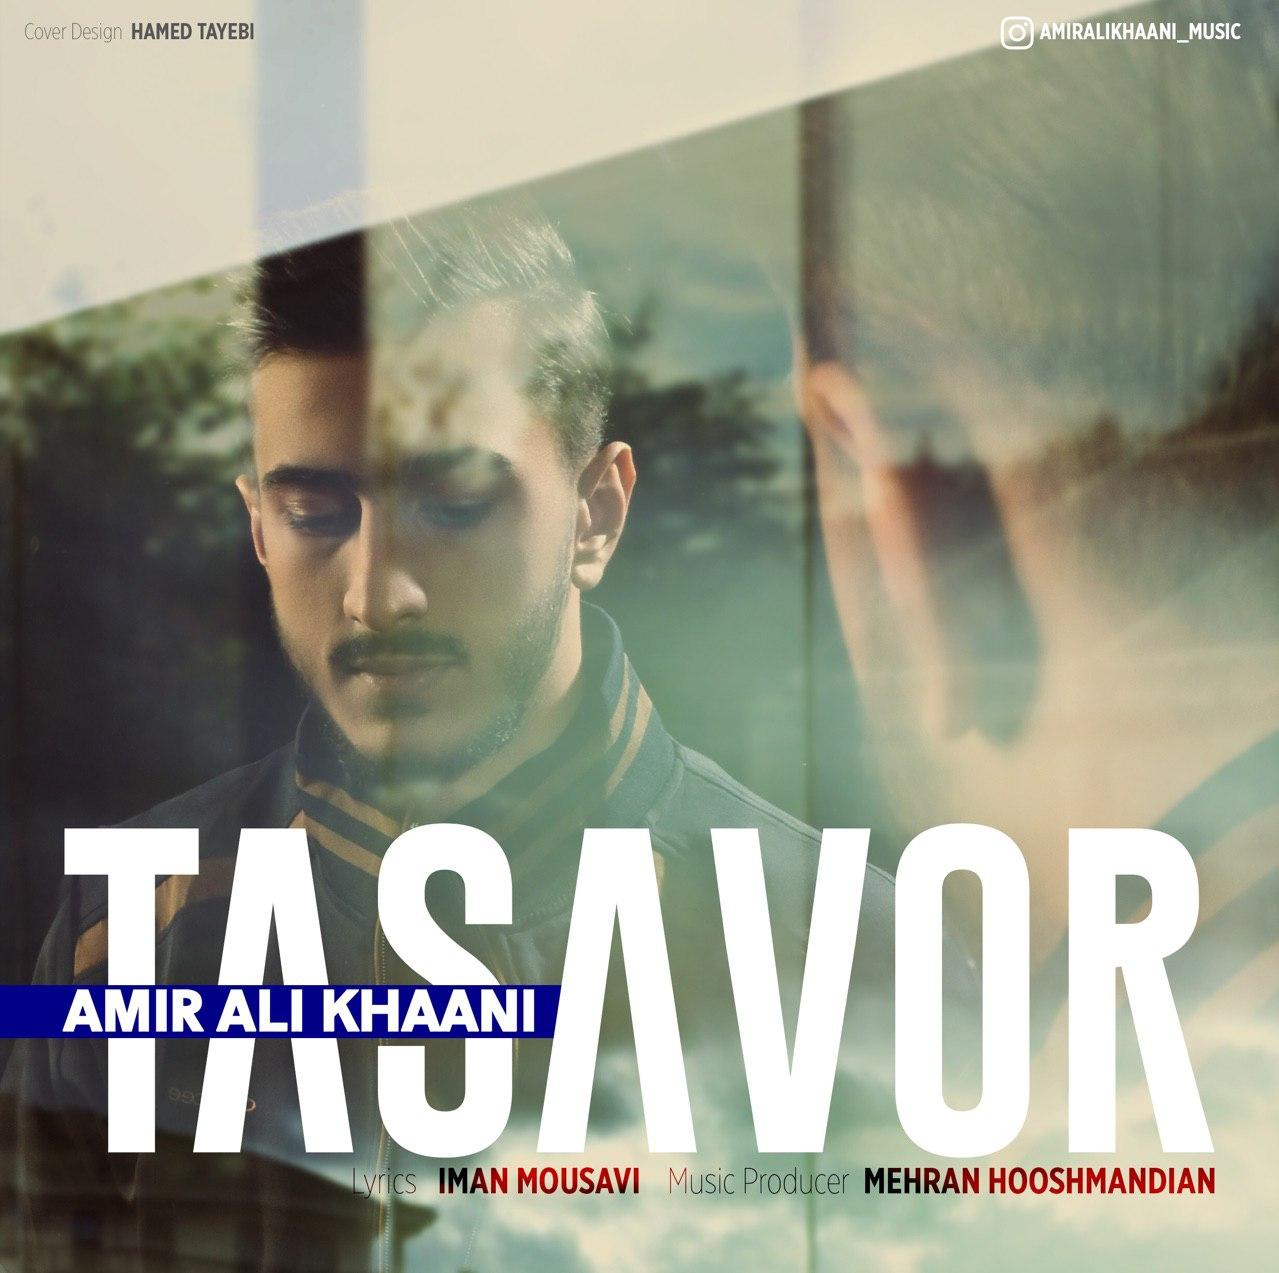 AmirAli Khani – Tasavor